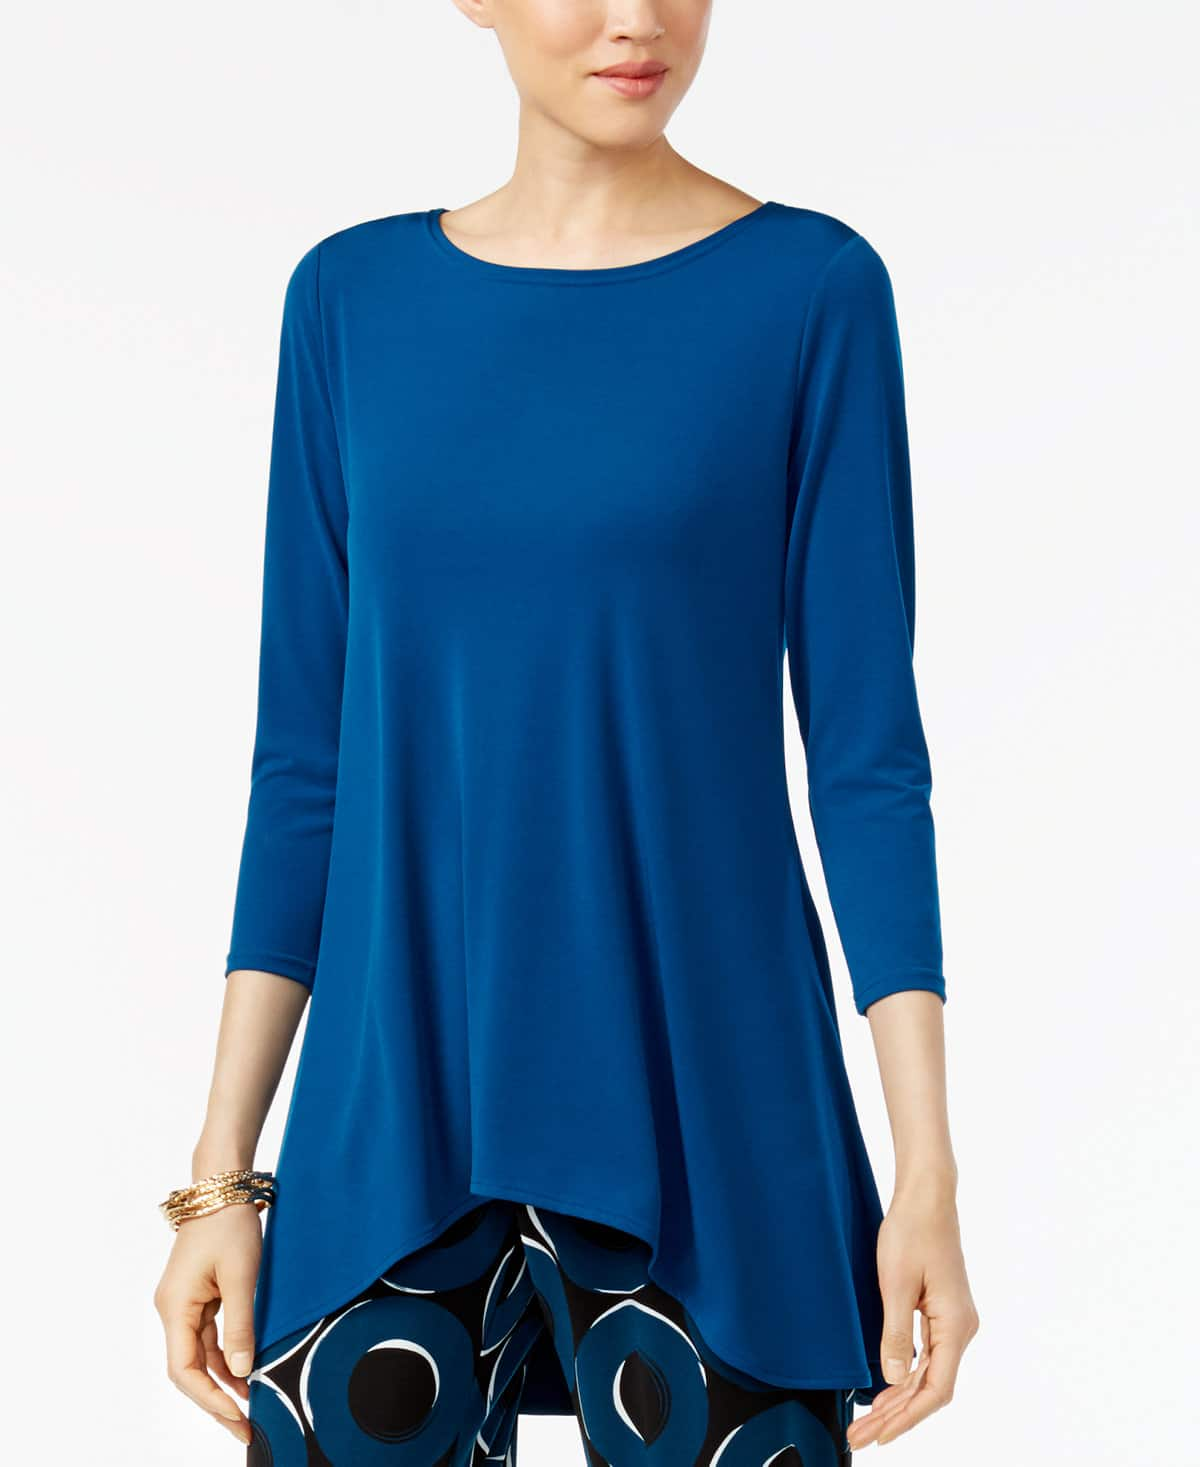 Alfani Jersey High-Low Tunic - $35.99 + Shipping